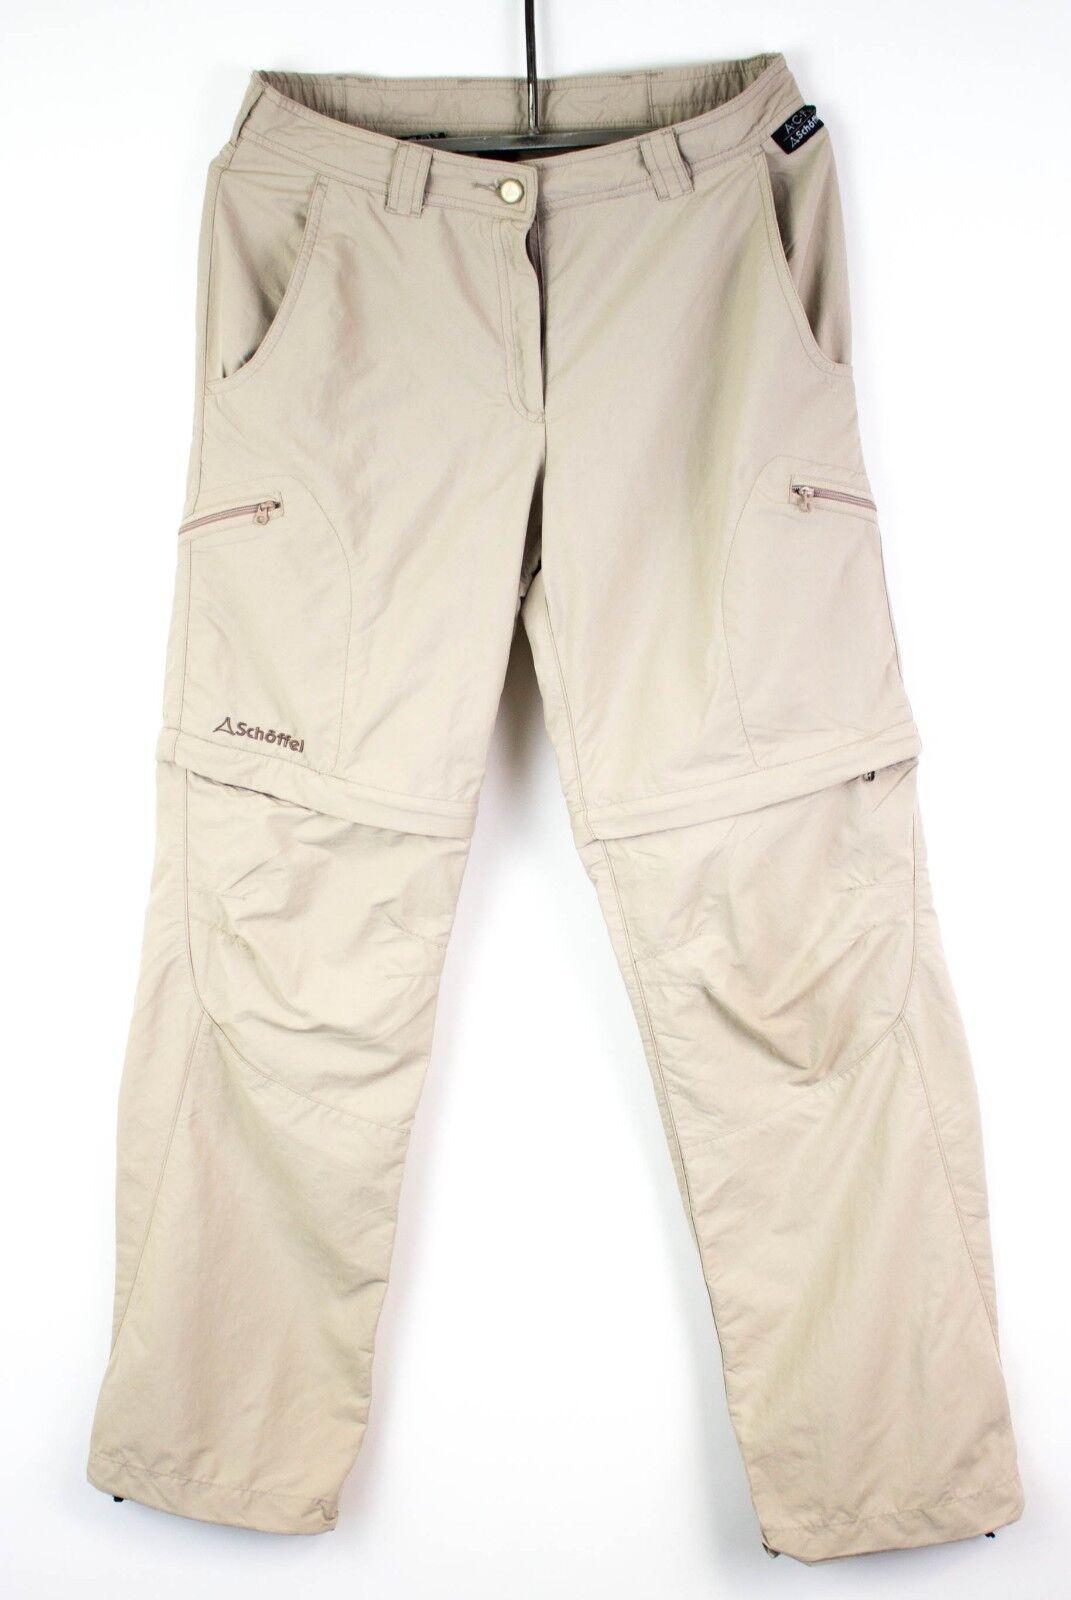 Schoffel women Pantaloni Staccabile Shorts Cz781 Active Comodi Misura